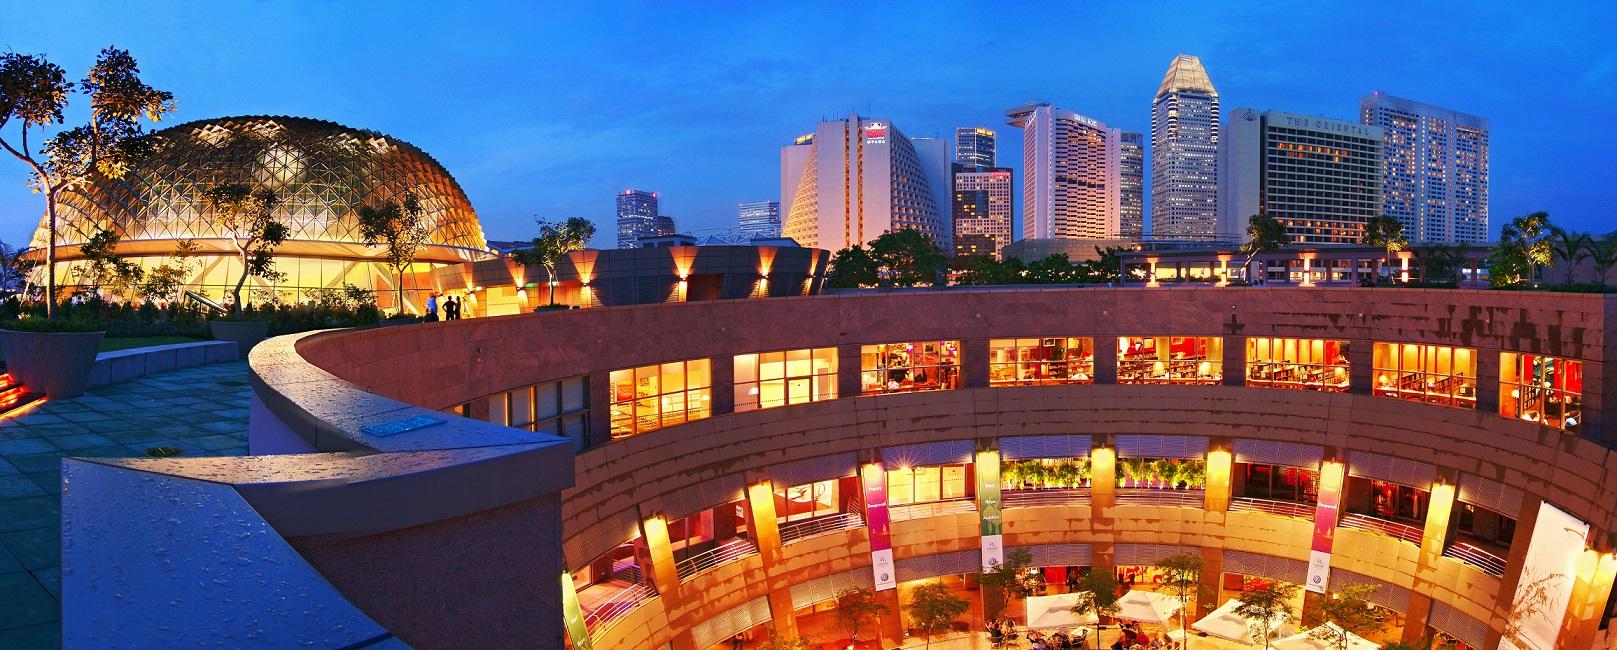 The Fullerton Hotel Singapore - TripAdvisor